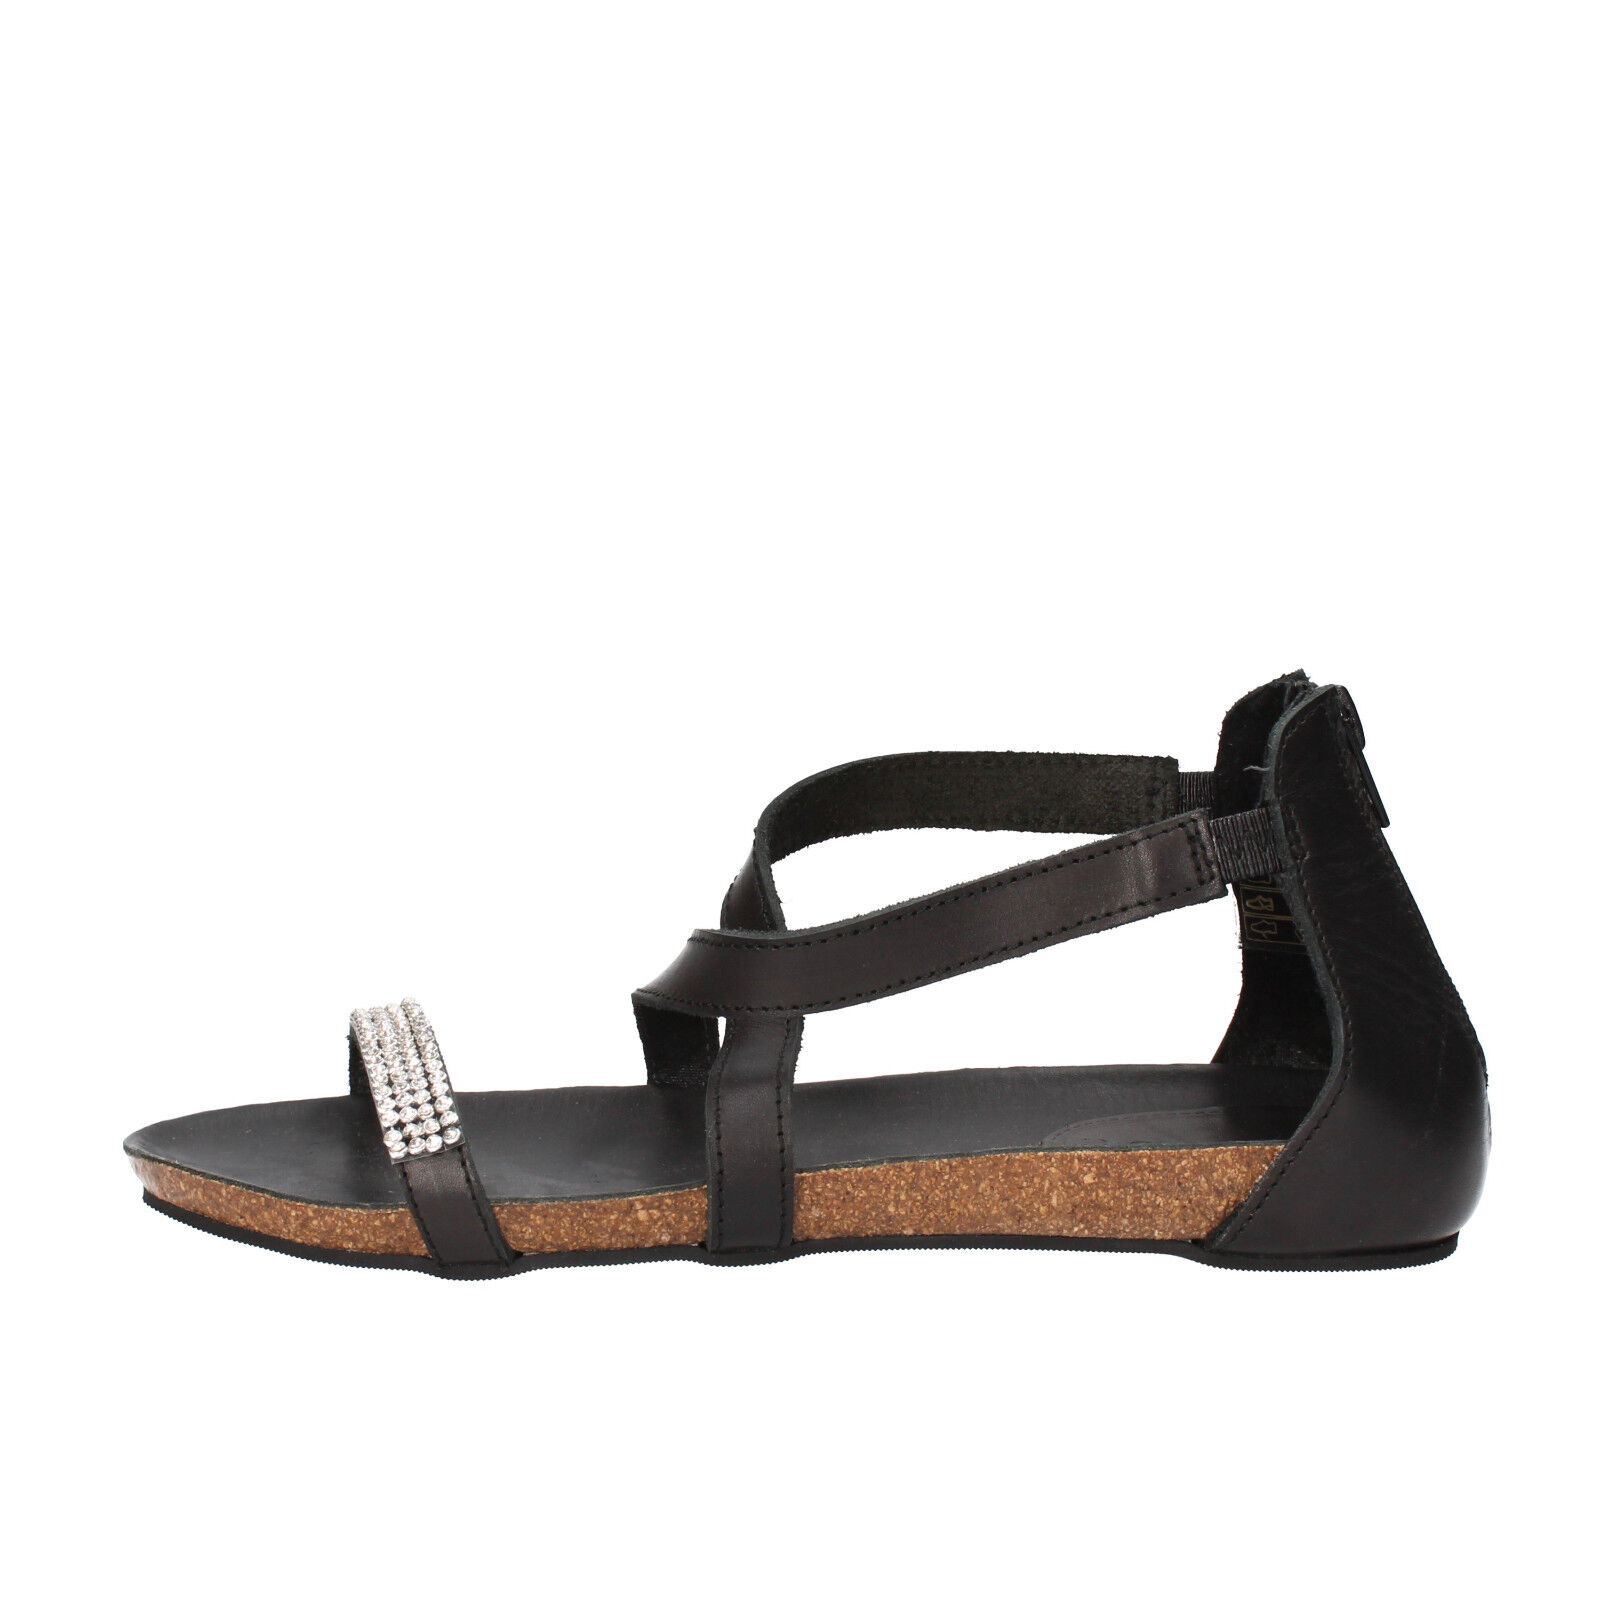 Scarpe donna pelle DOCKSTEPS 38 EU sandali nero pelle donna / strass AG855-C1 92d81a